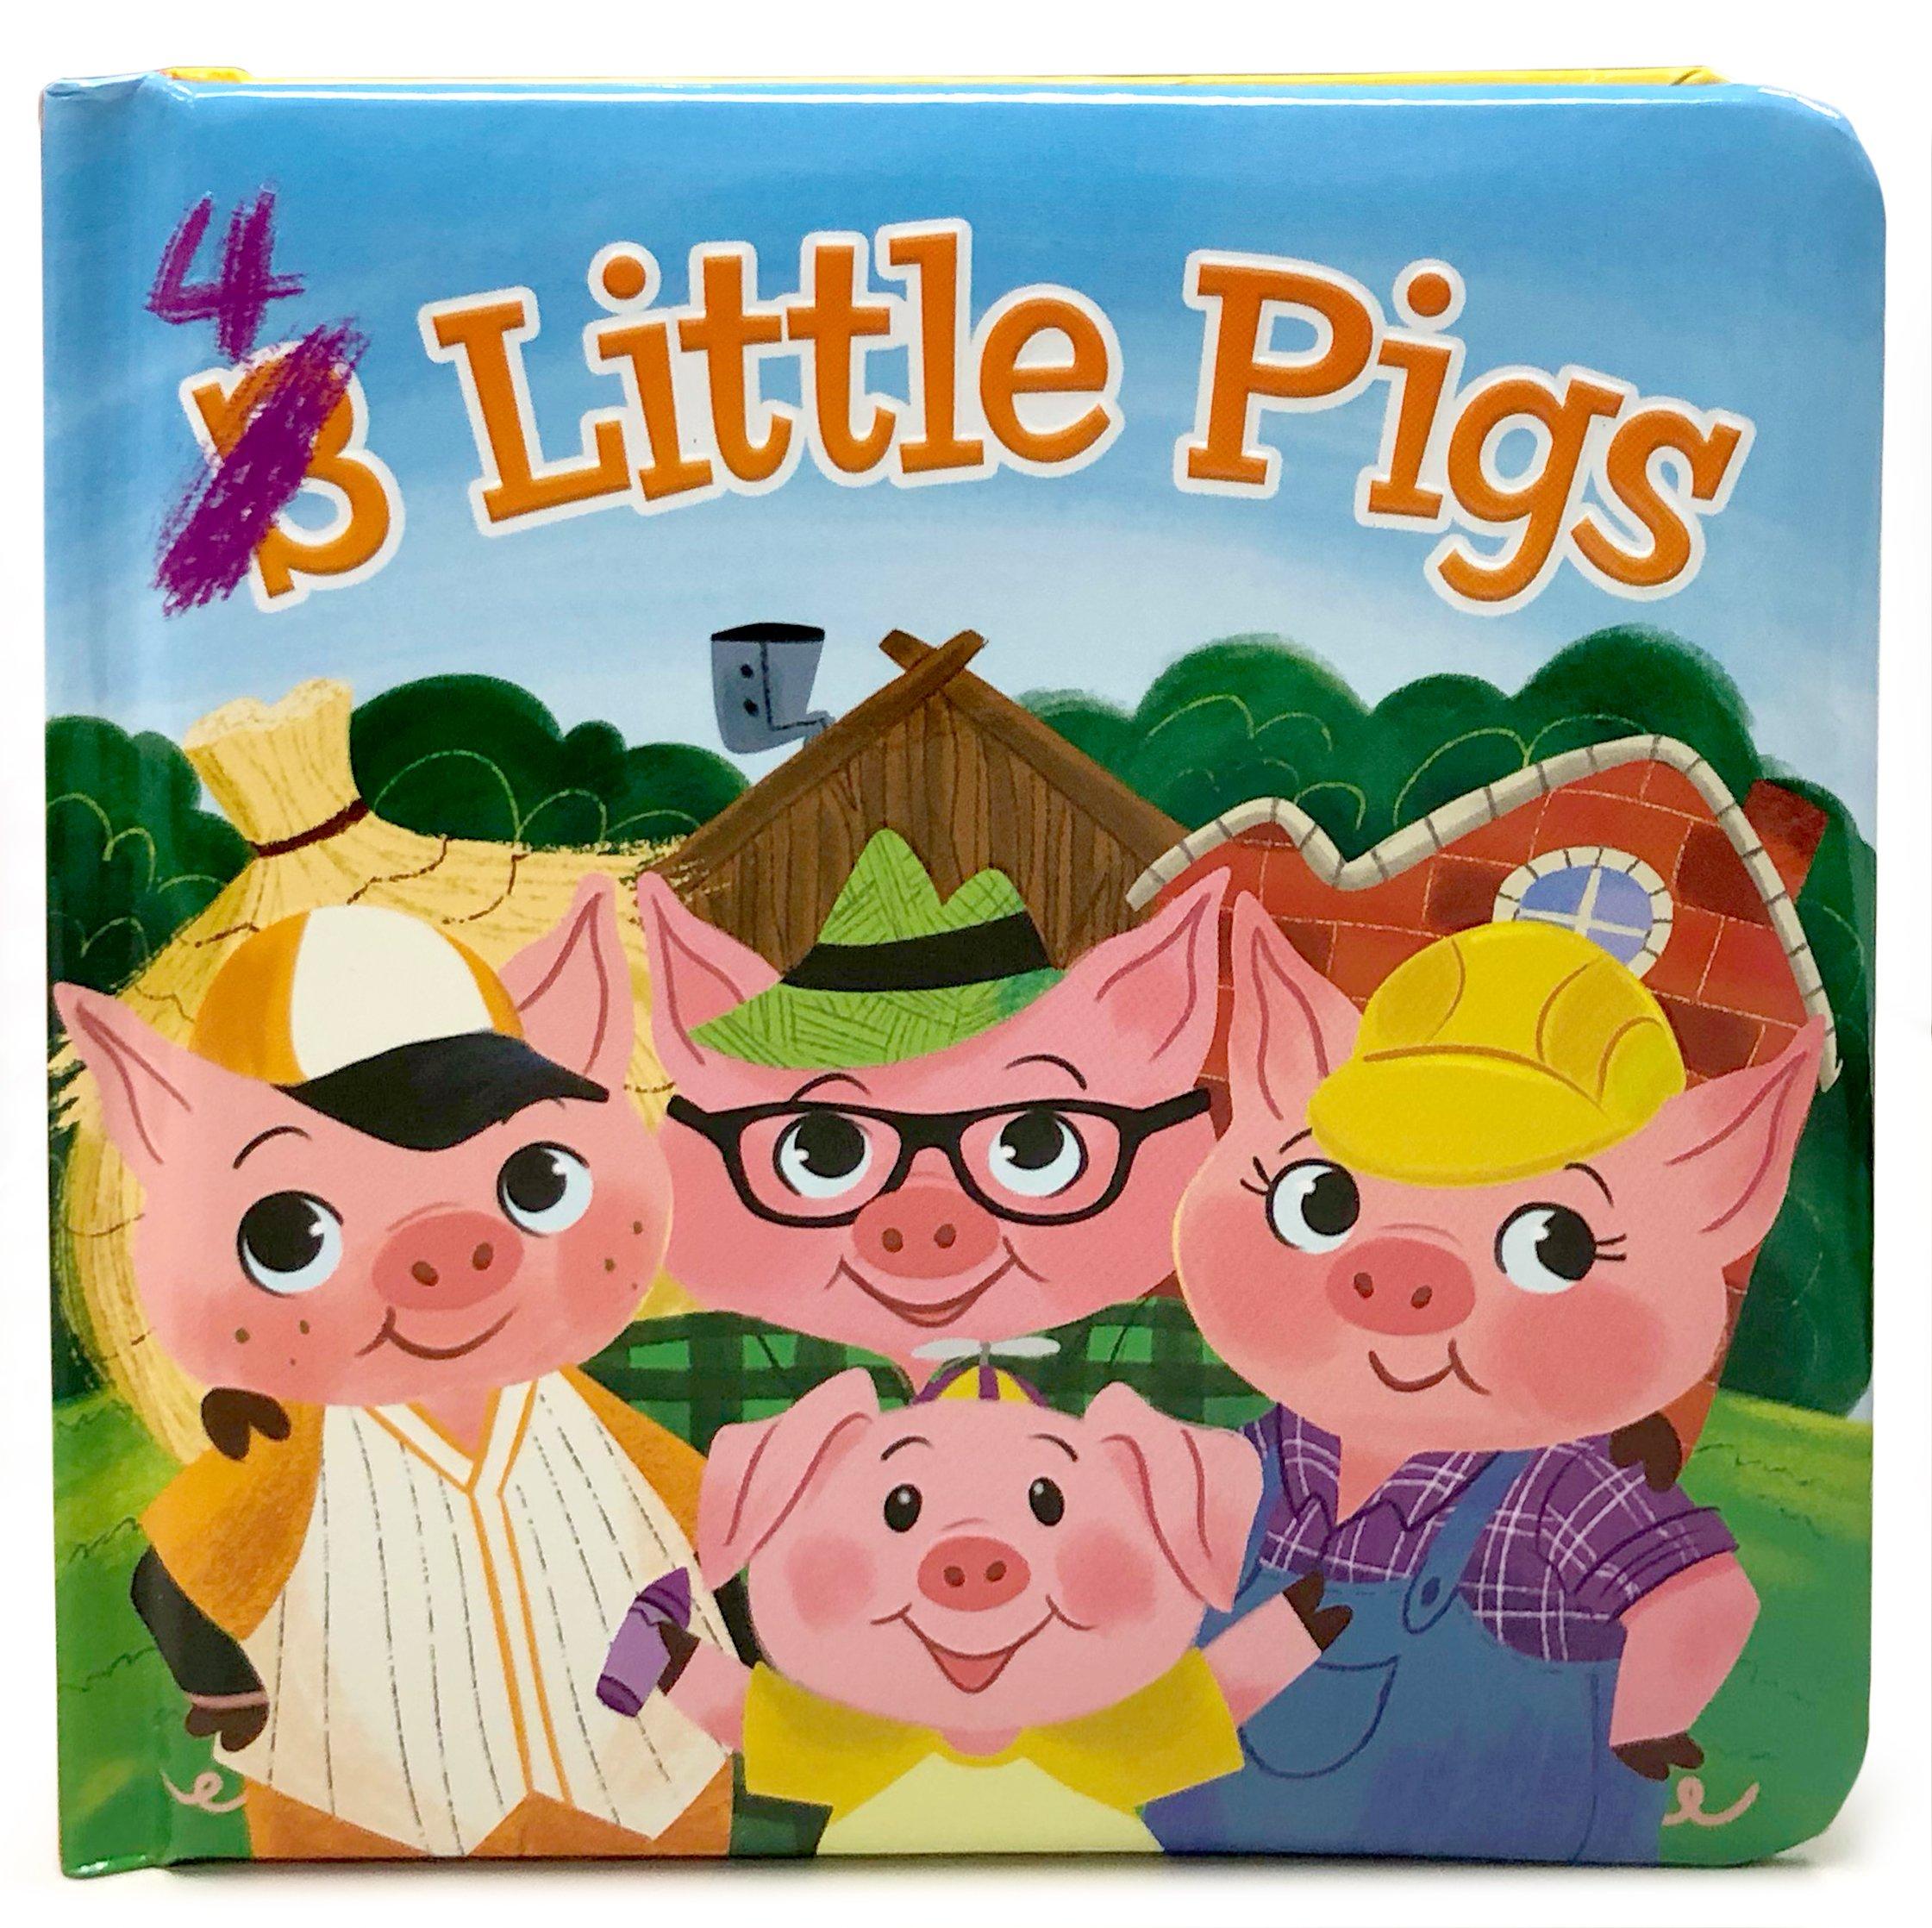 Amazon.com: 4 Little Pigs: Padded Board Book (Little Bird Stories ...